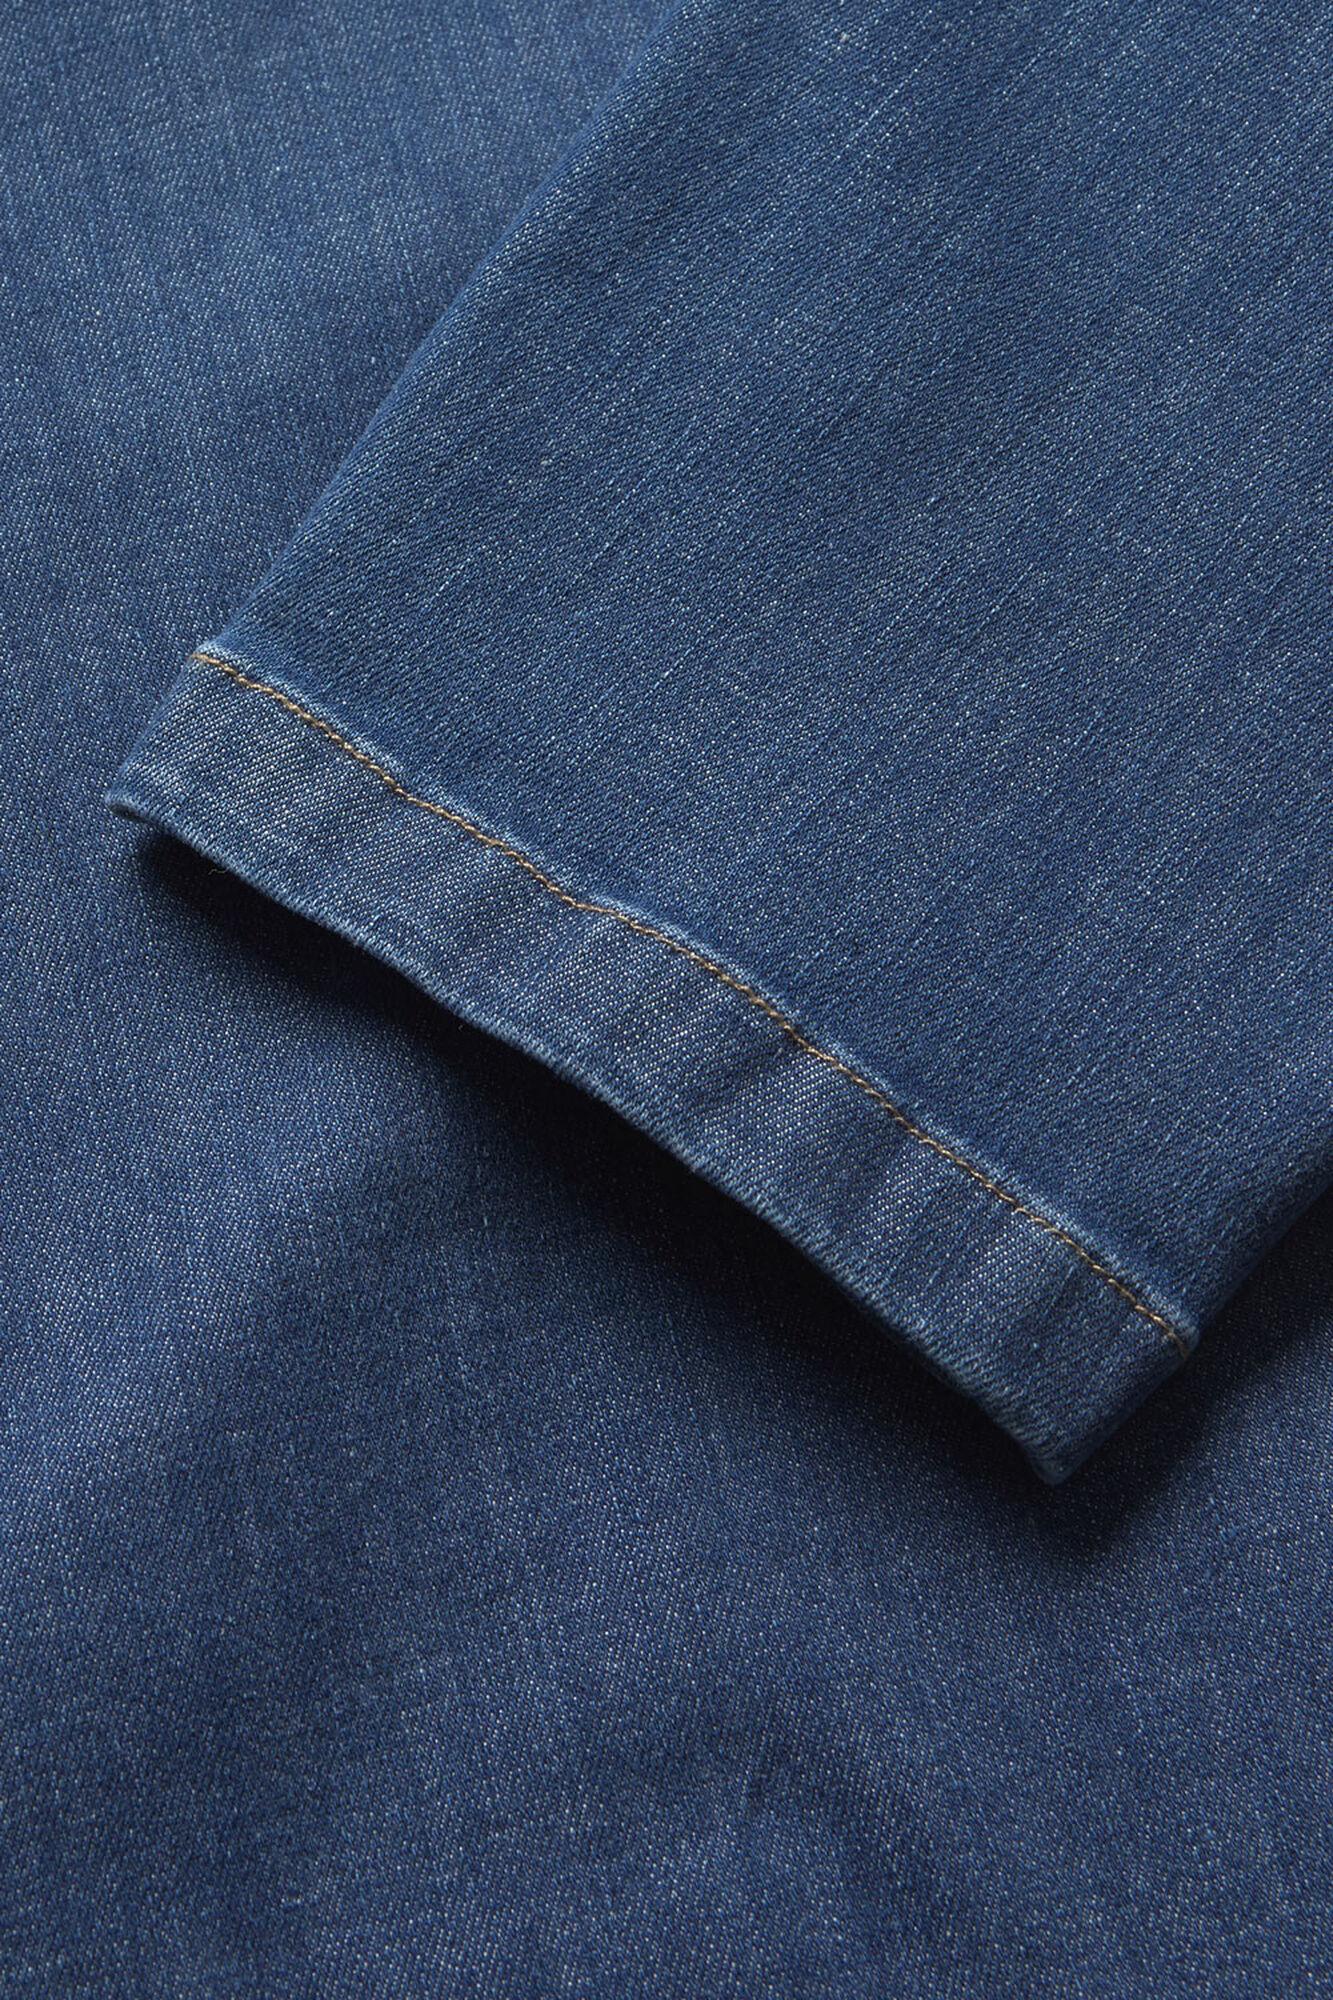 PANDY REGULAR, Blue Denim, hi-res